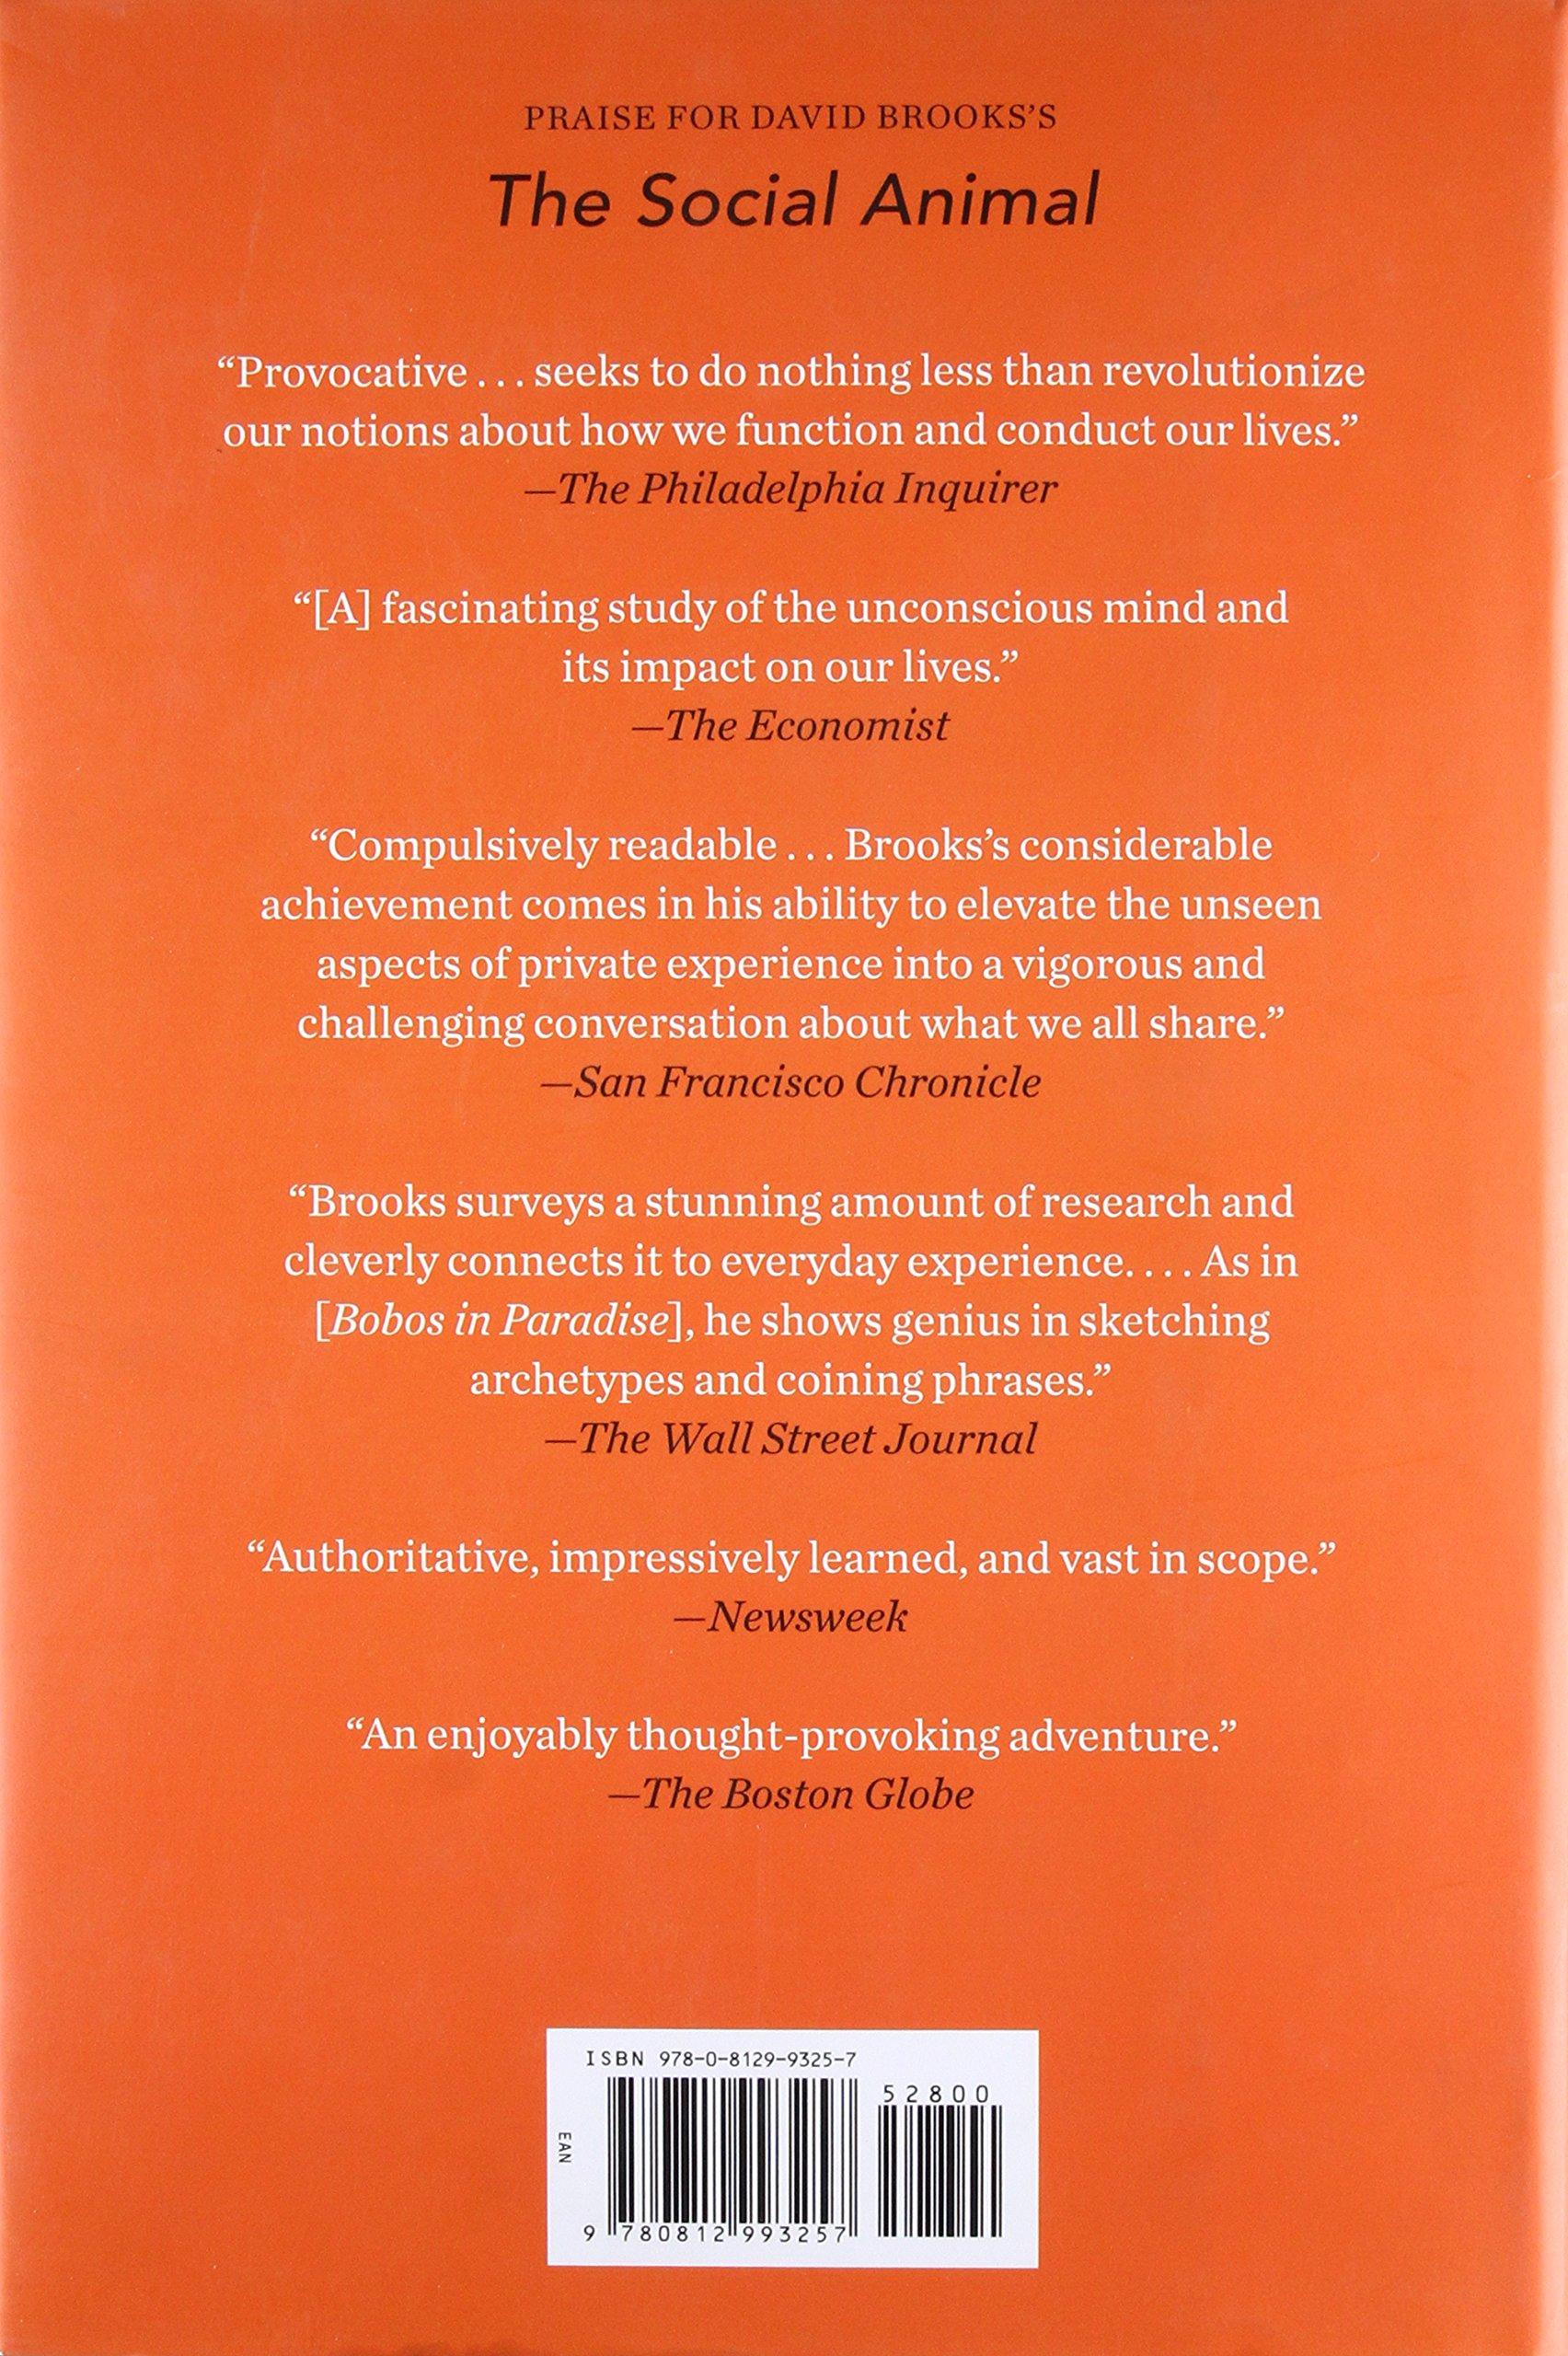 The Road To Character David Brooks 9780812993257 Amazon Com Books